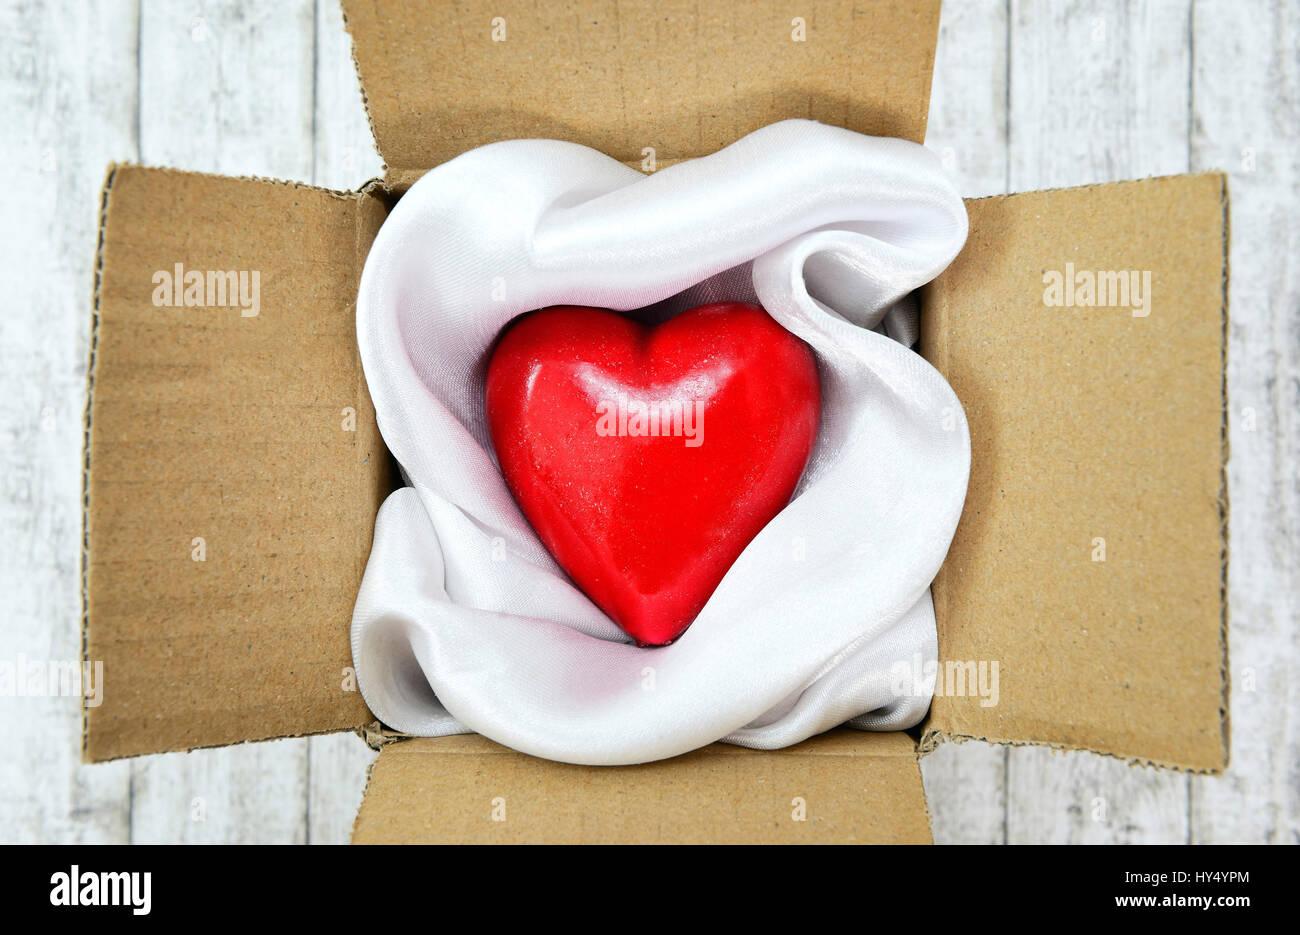 Corazón en un paquete, Valentinstag, Herz en einem Paket Foto de stock